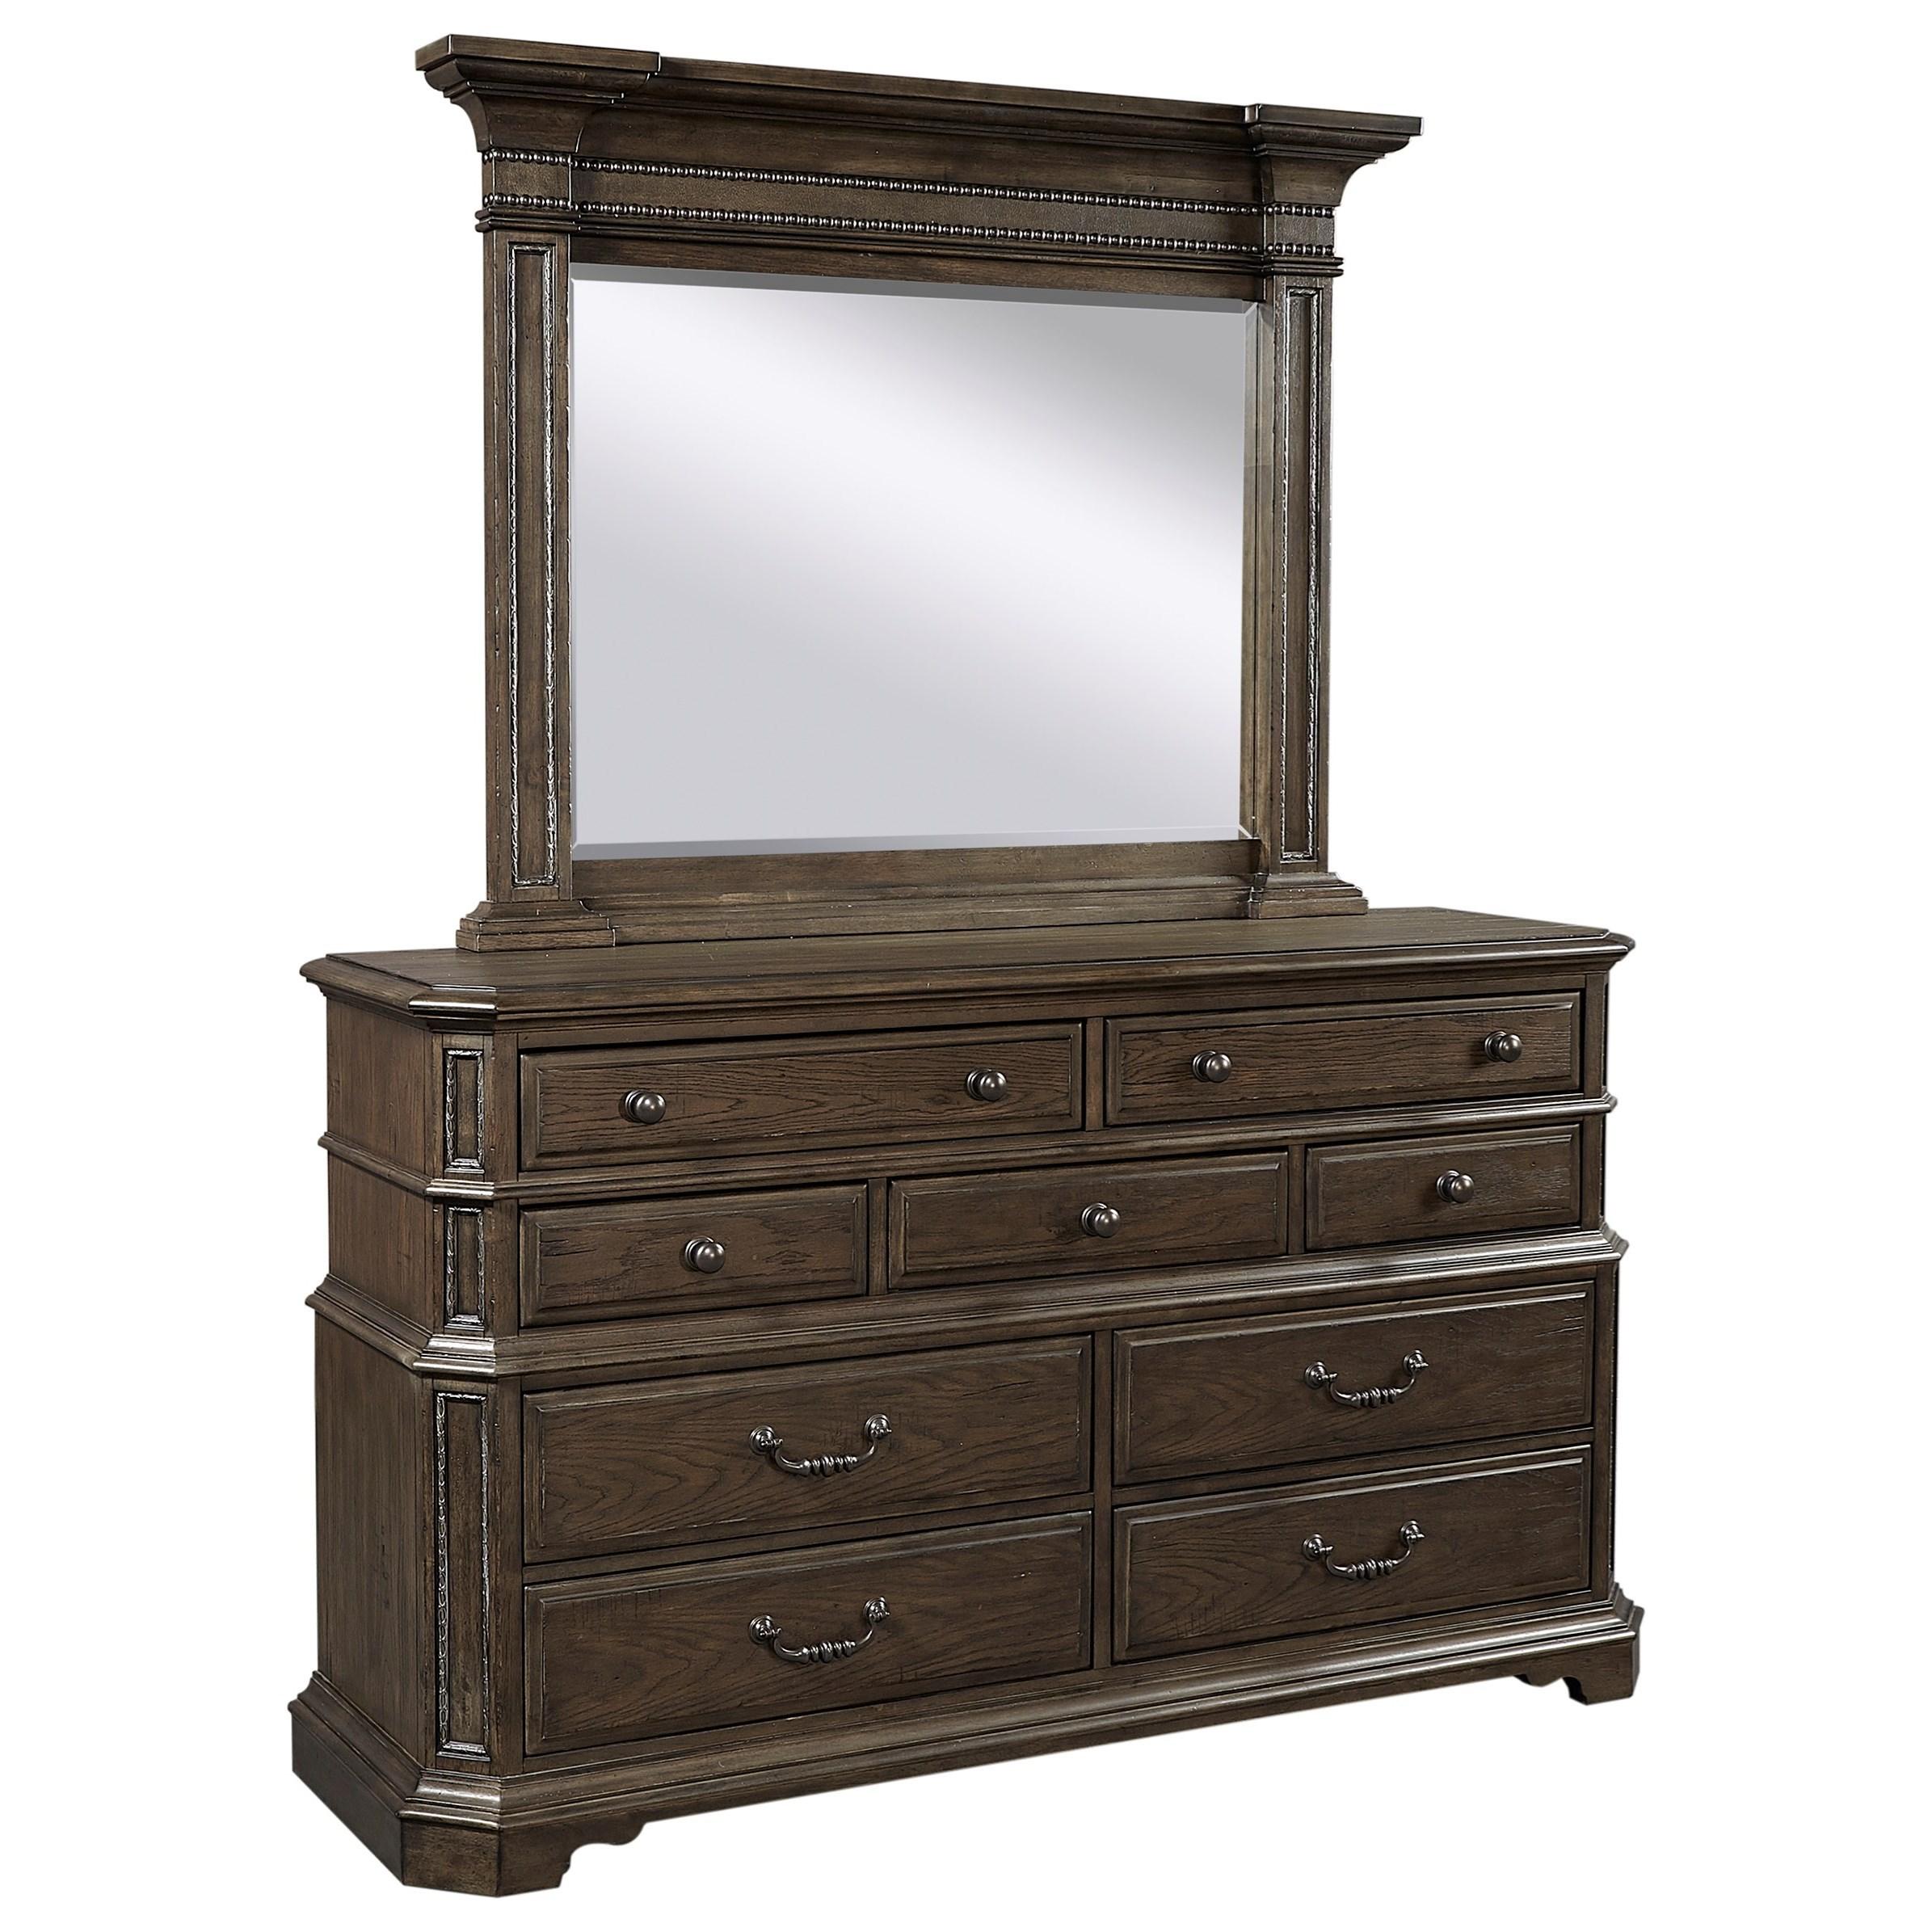 Foxhill Dresser + Mirror Set by Aspenhome at Walker's Furniture